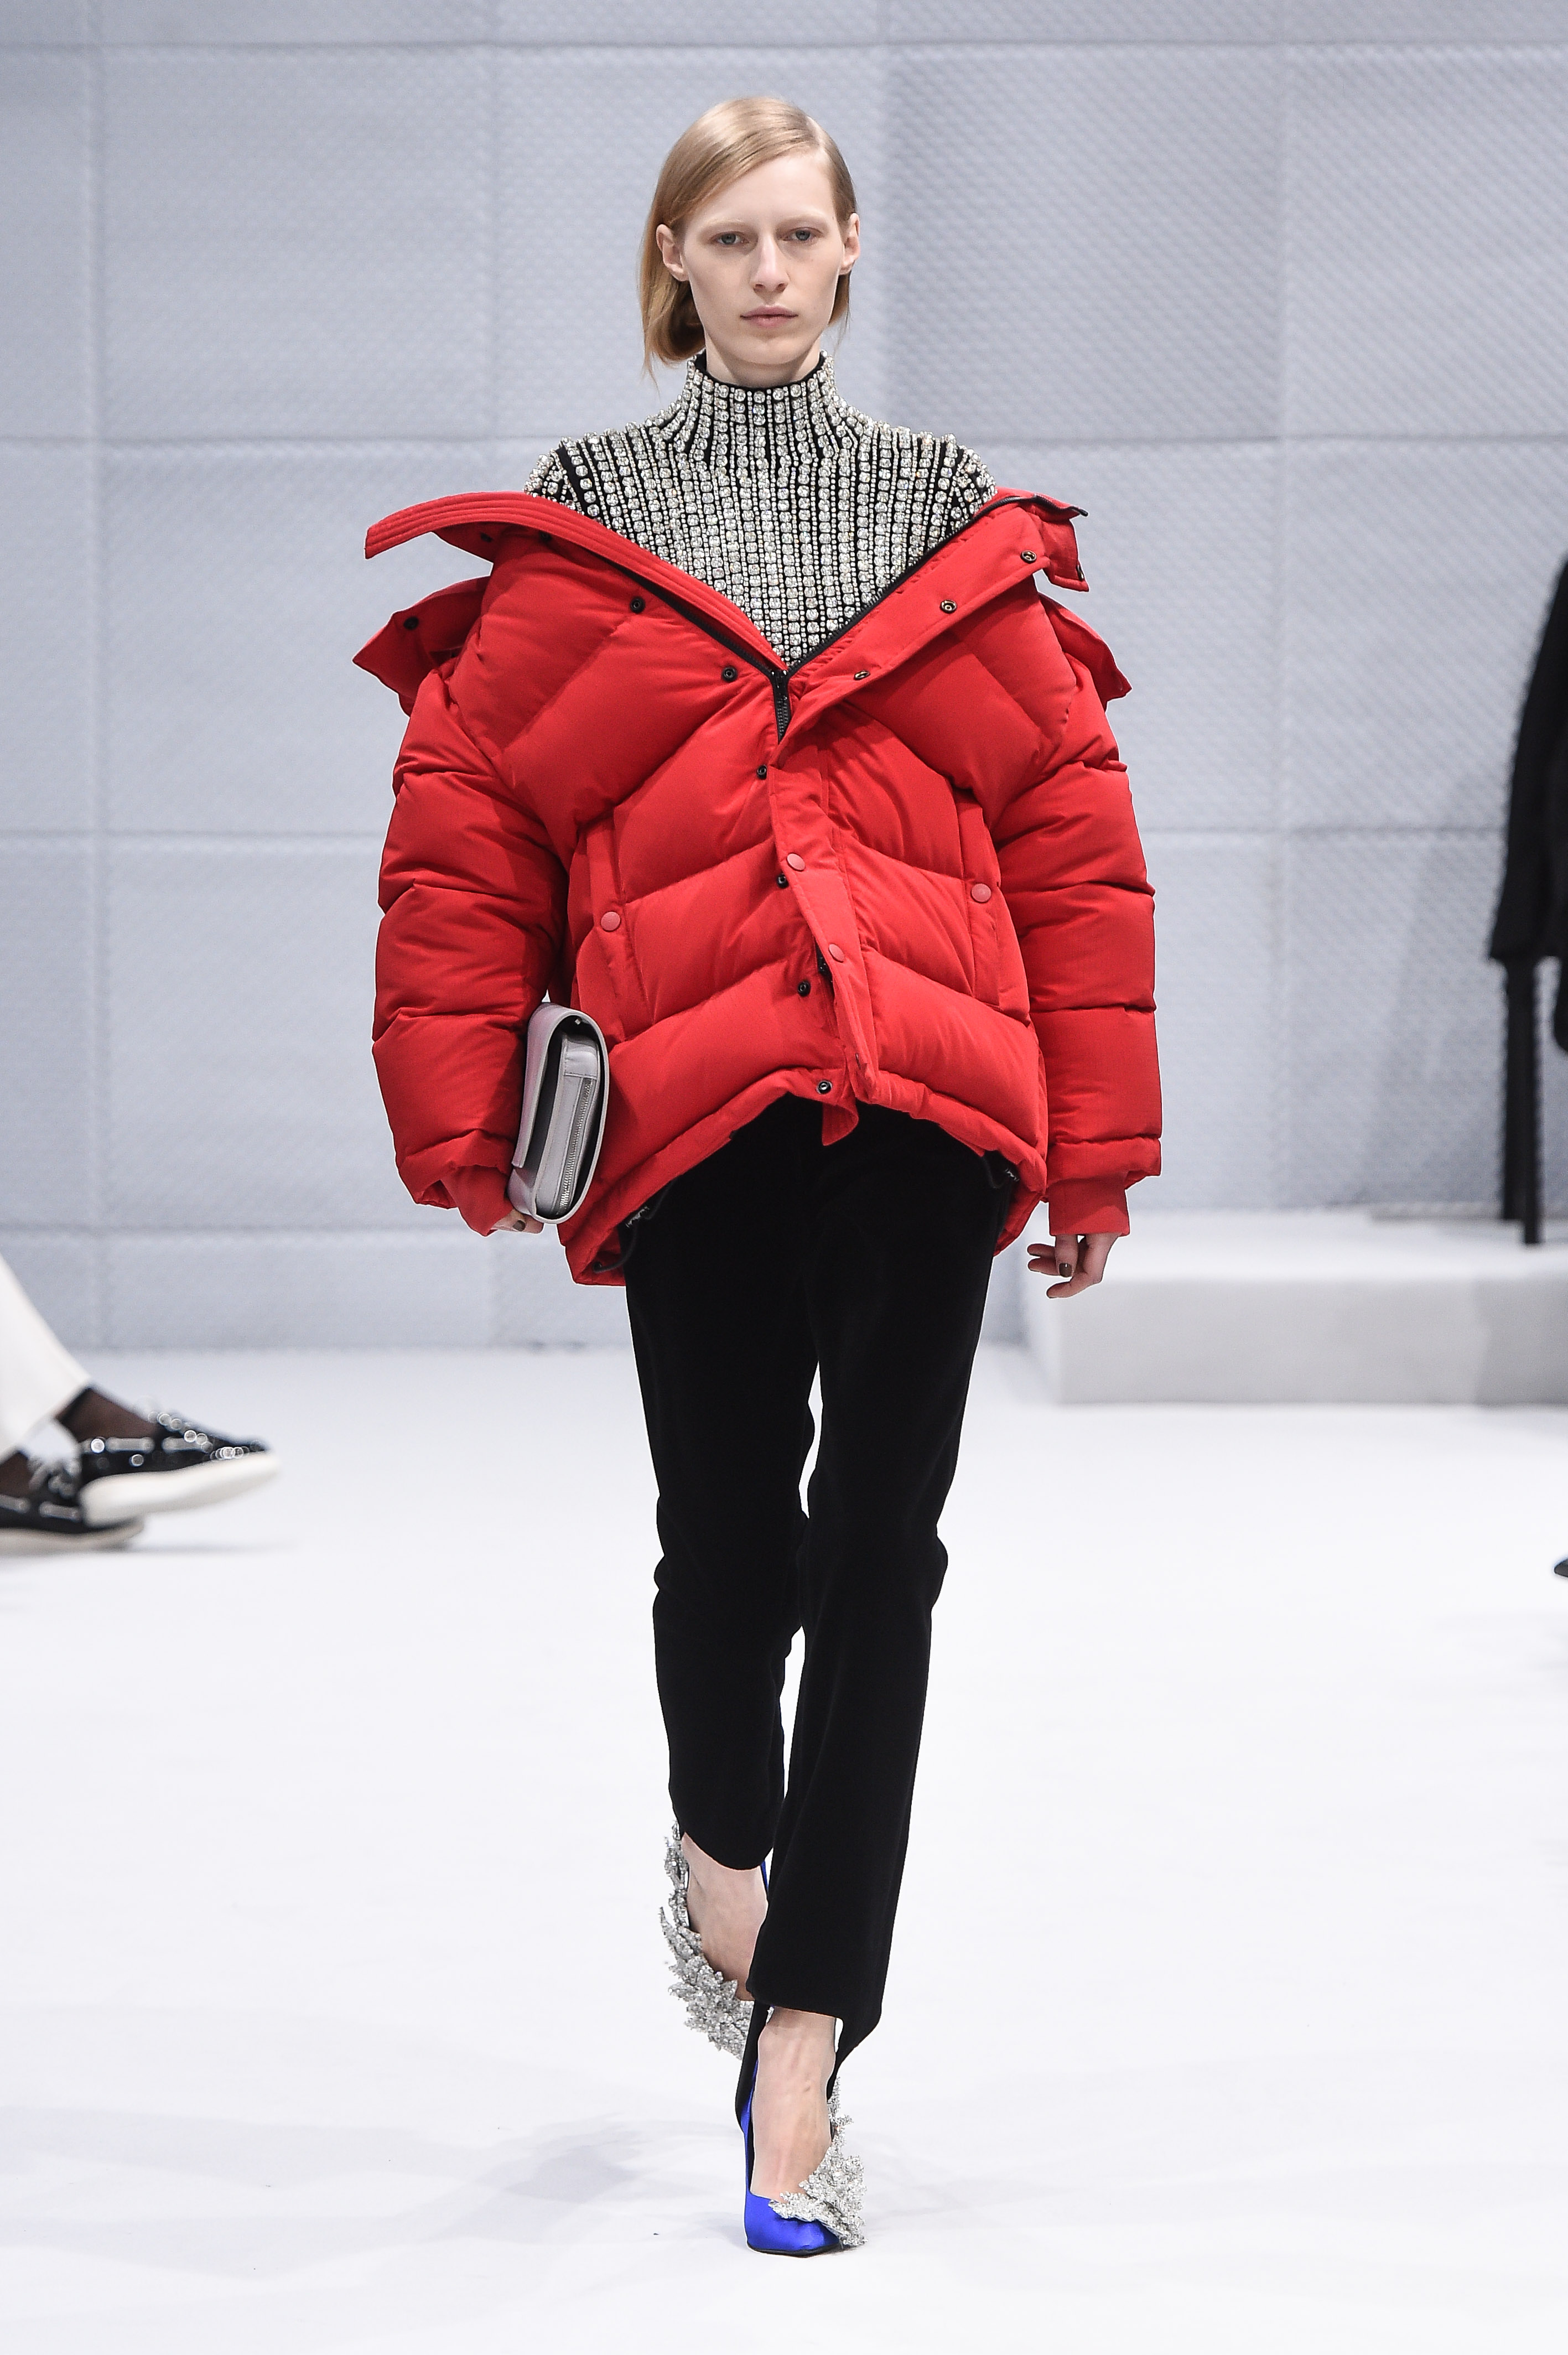 trend daunenjacke pufferjacket designer catwalk laufsteg balenciaga rot schulter julia nobis modepilot